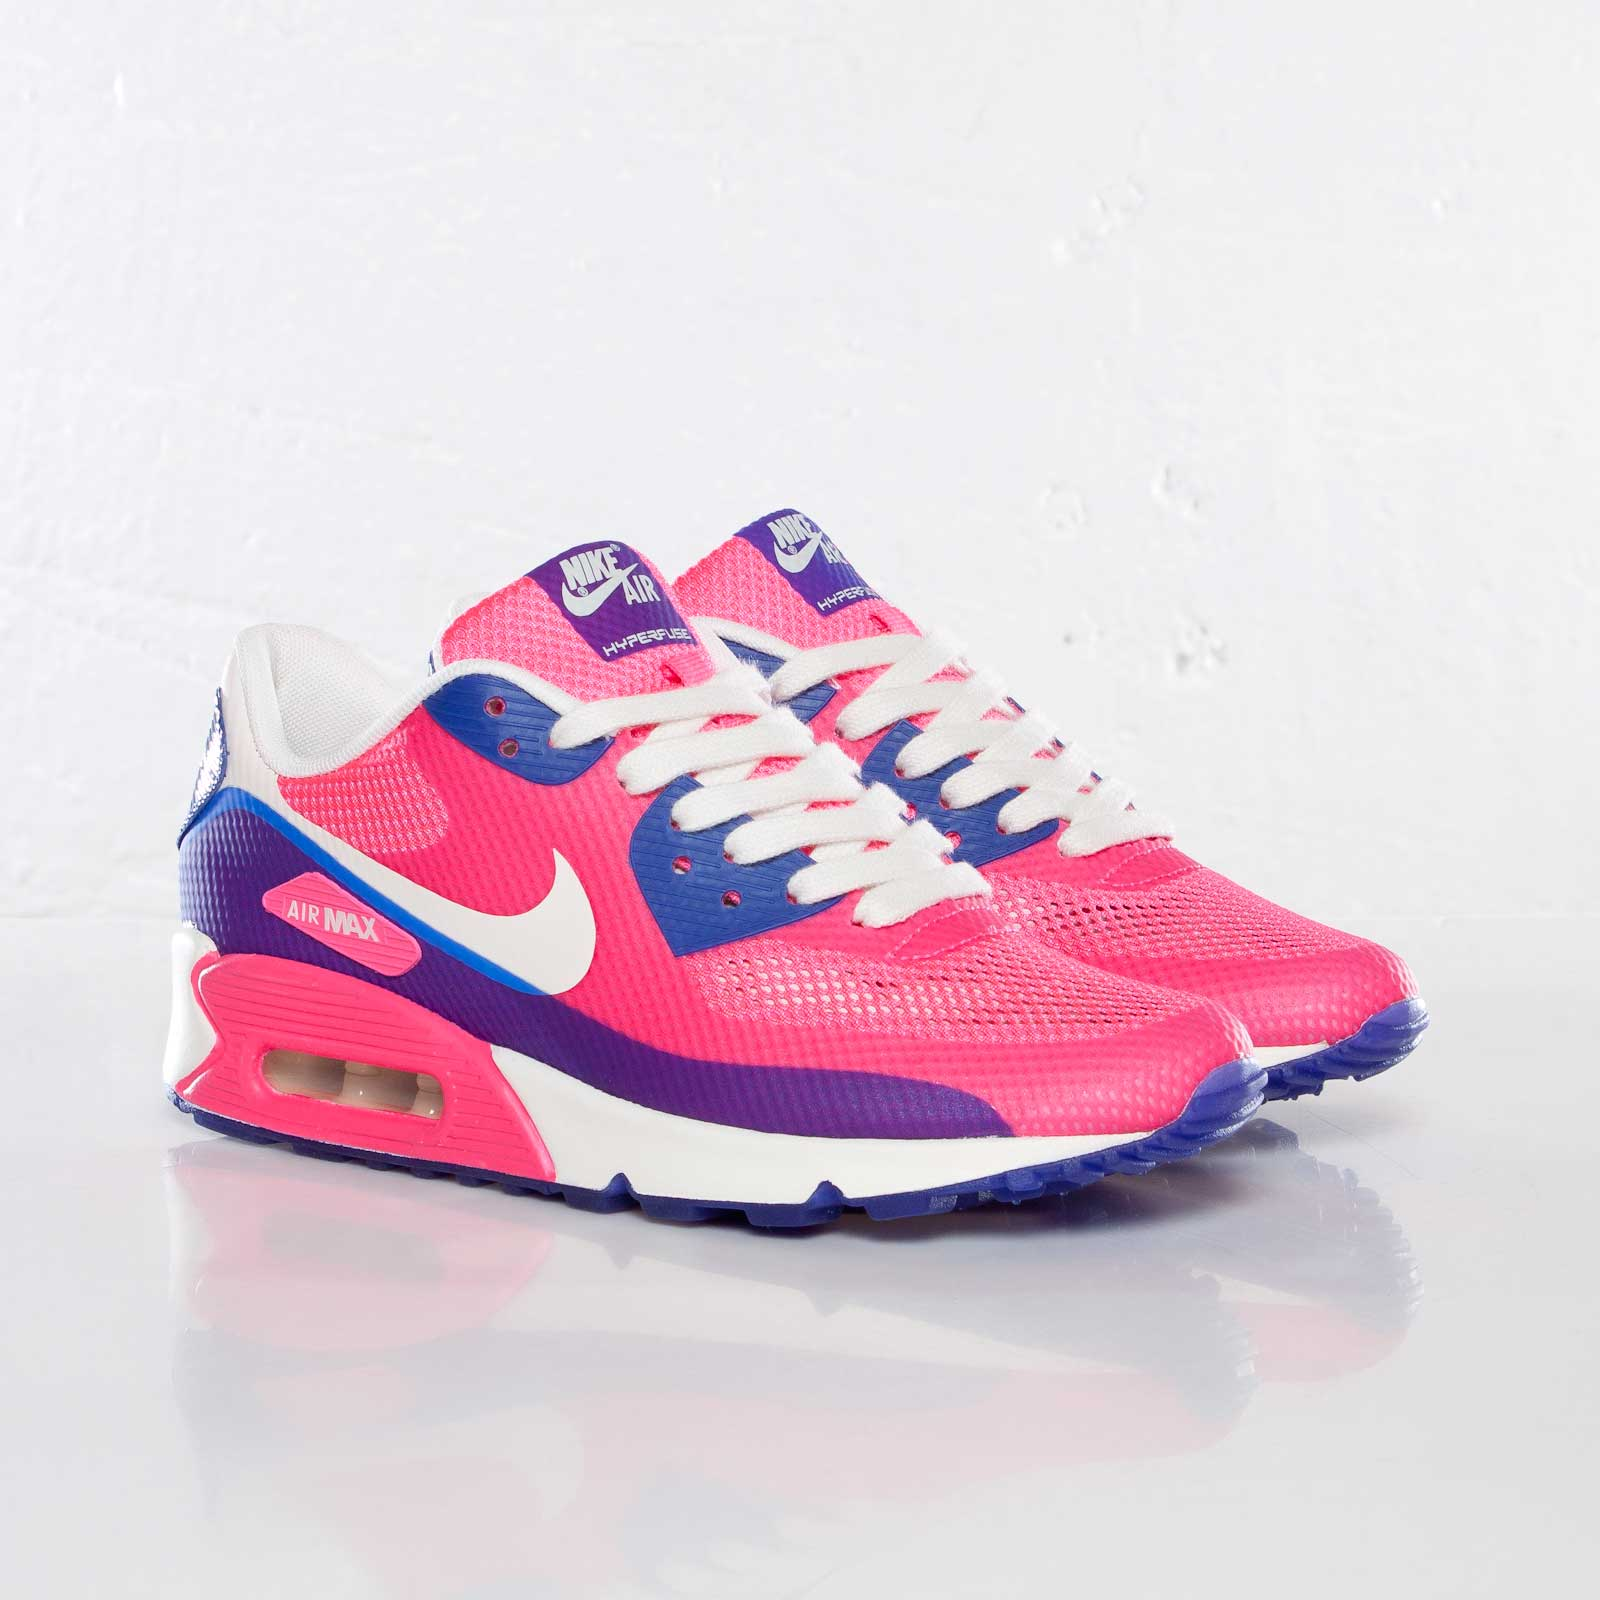 Nike Wmns Air Max 90 Hyp Prm 454460 600 Sneakersnstuff